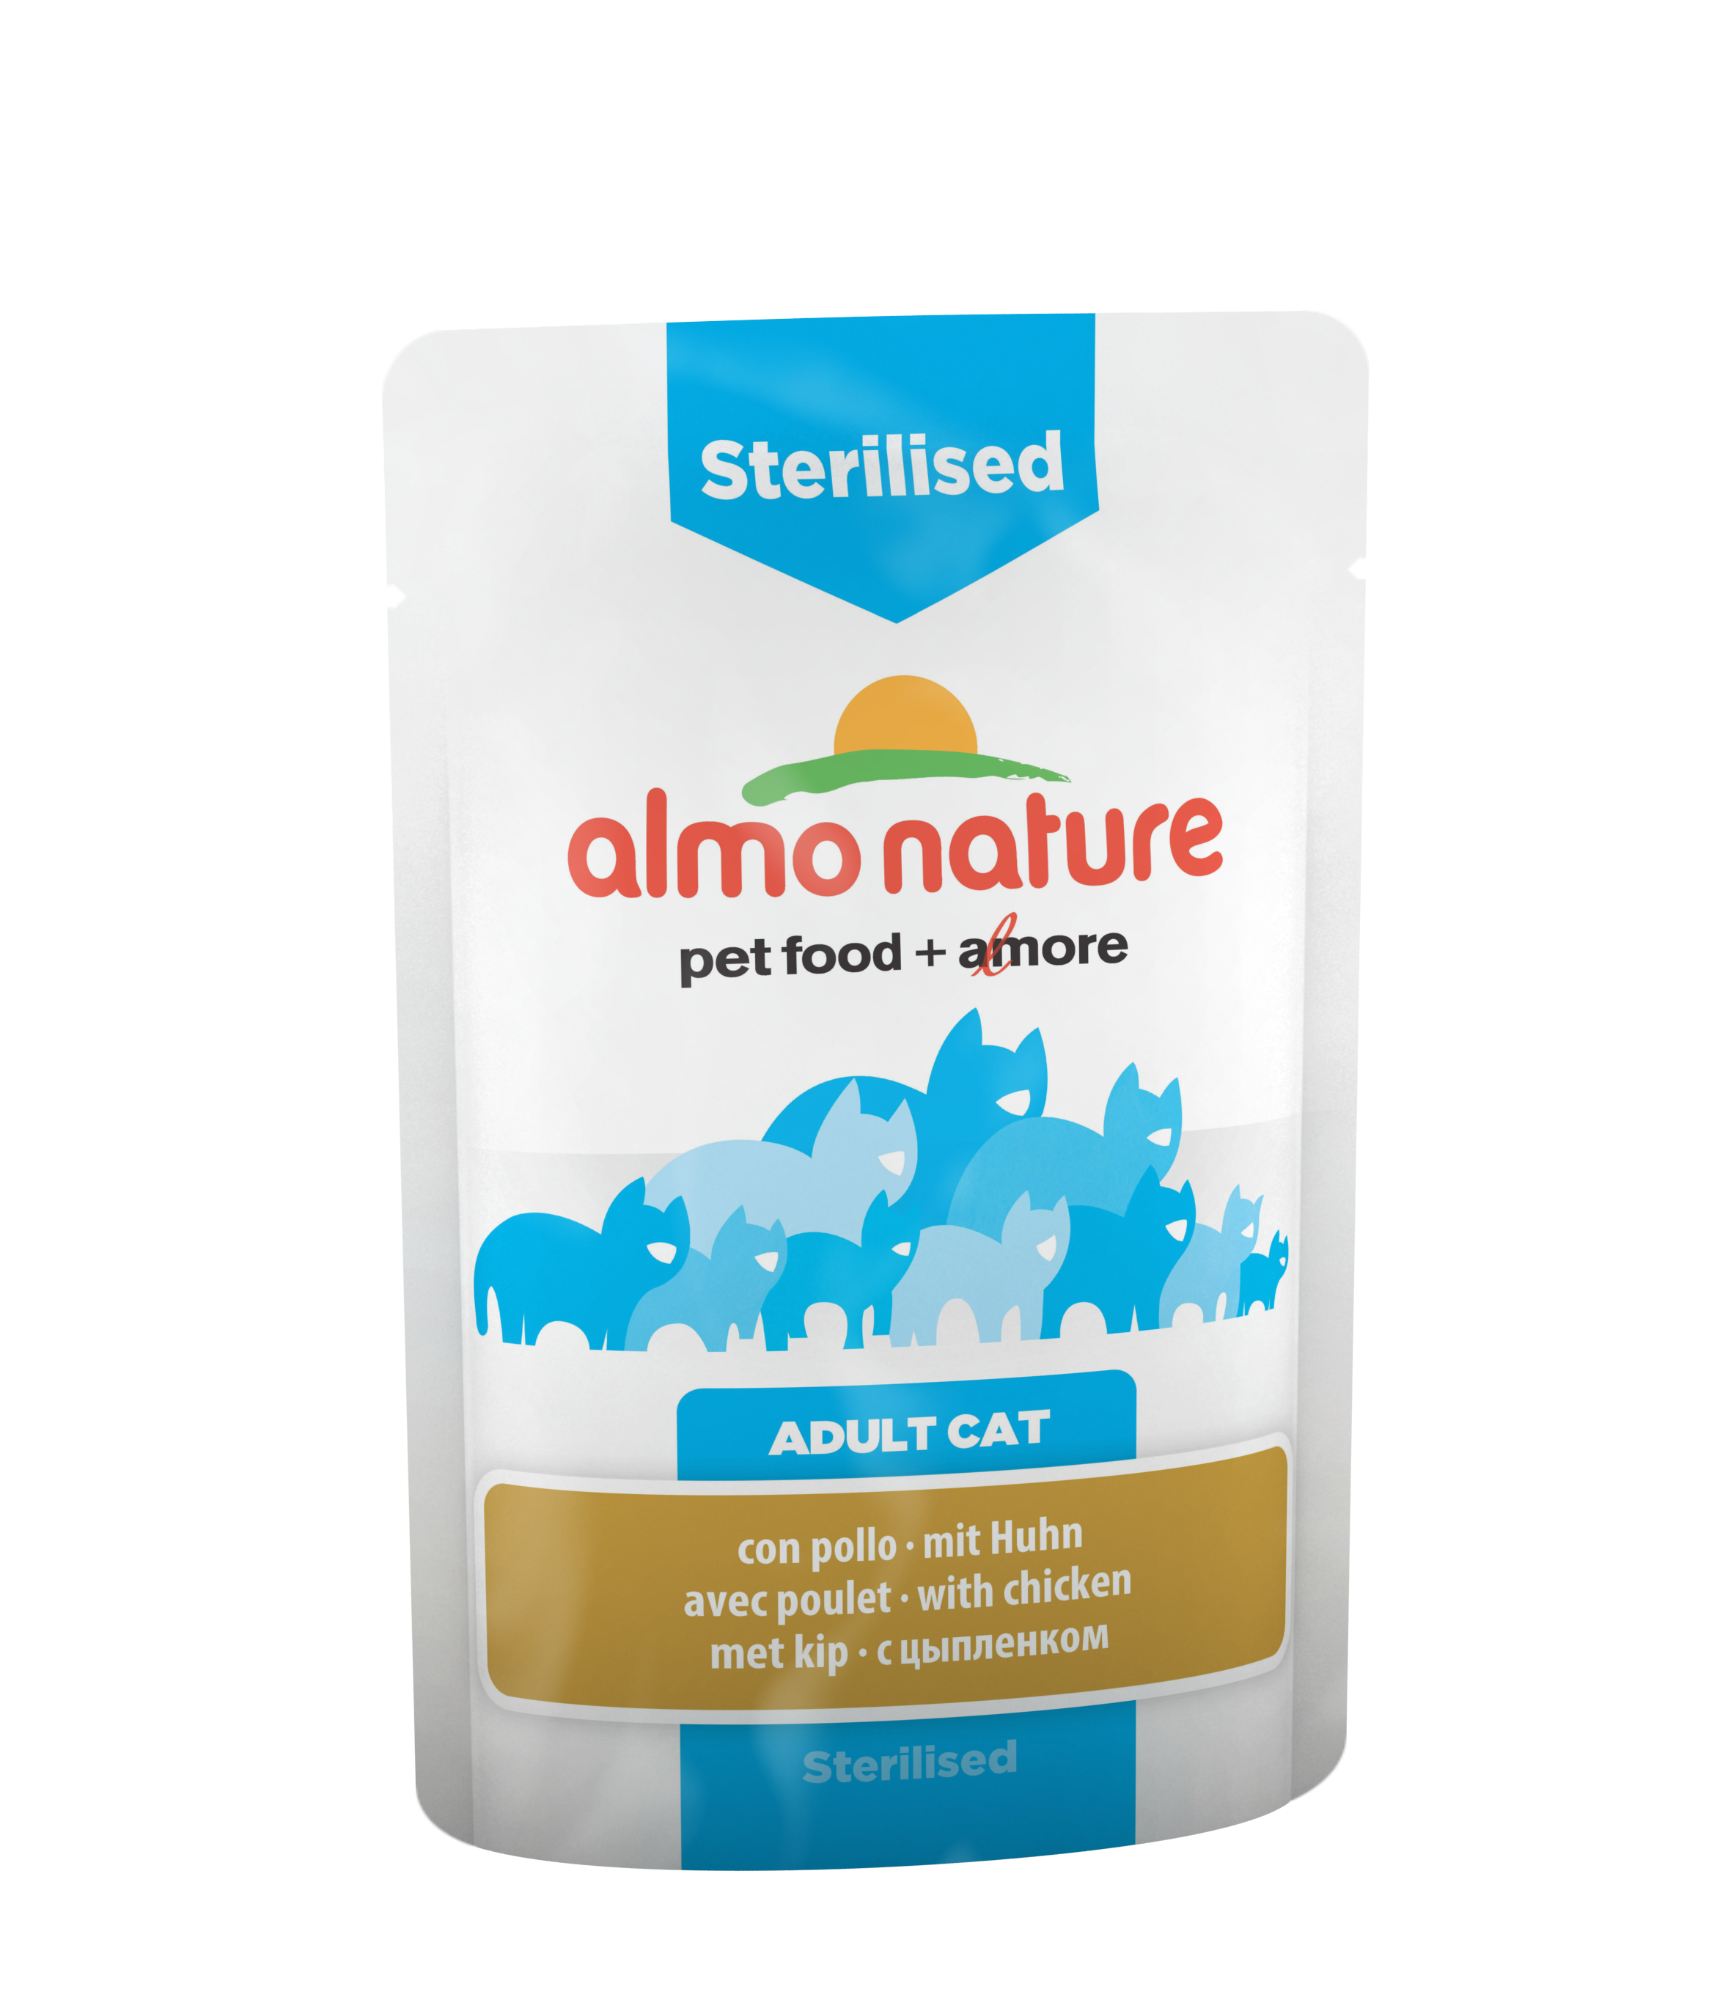 Kačių ėdalas ALMO NATURE Functional – sterilizuotiems, su vištiena, 70 g